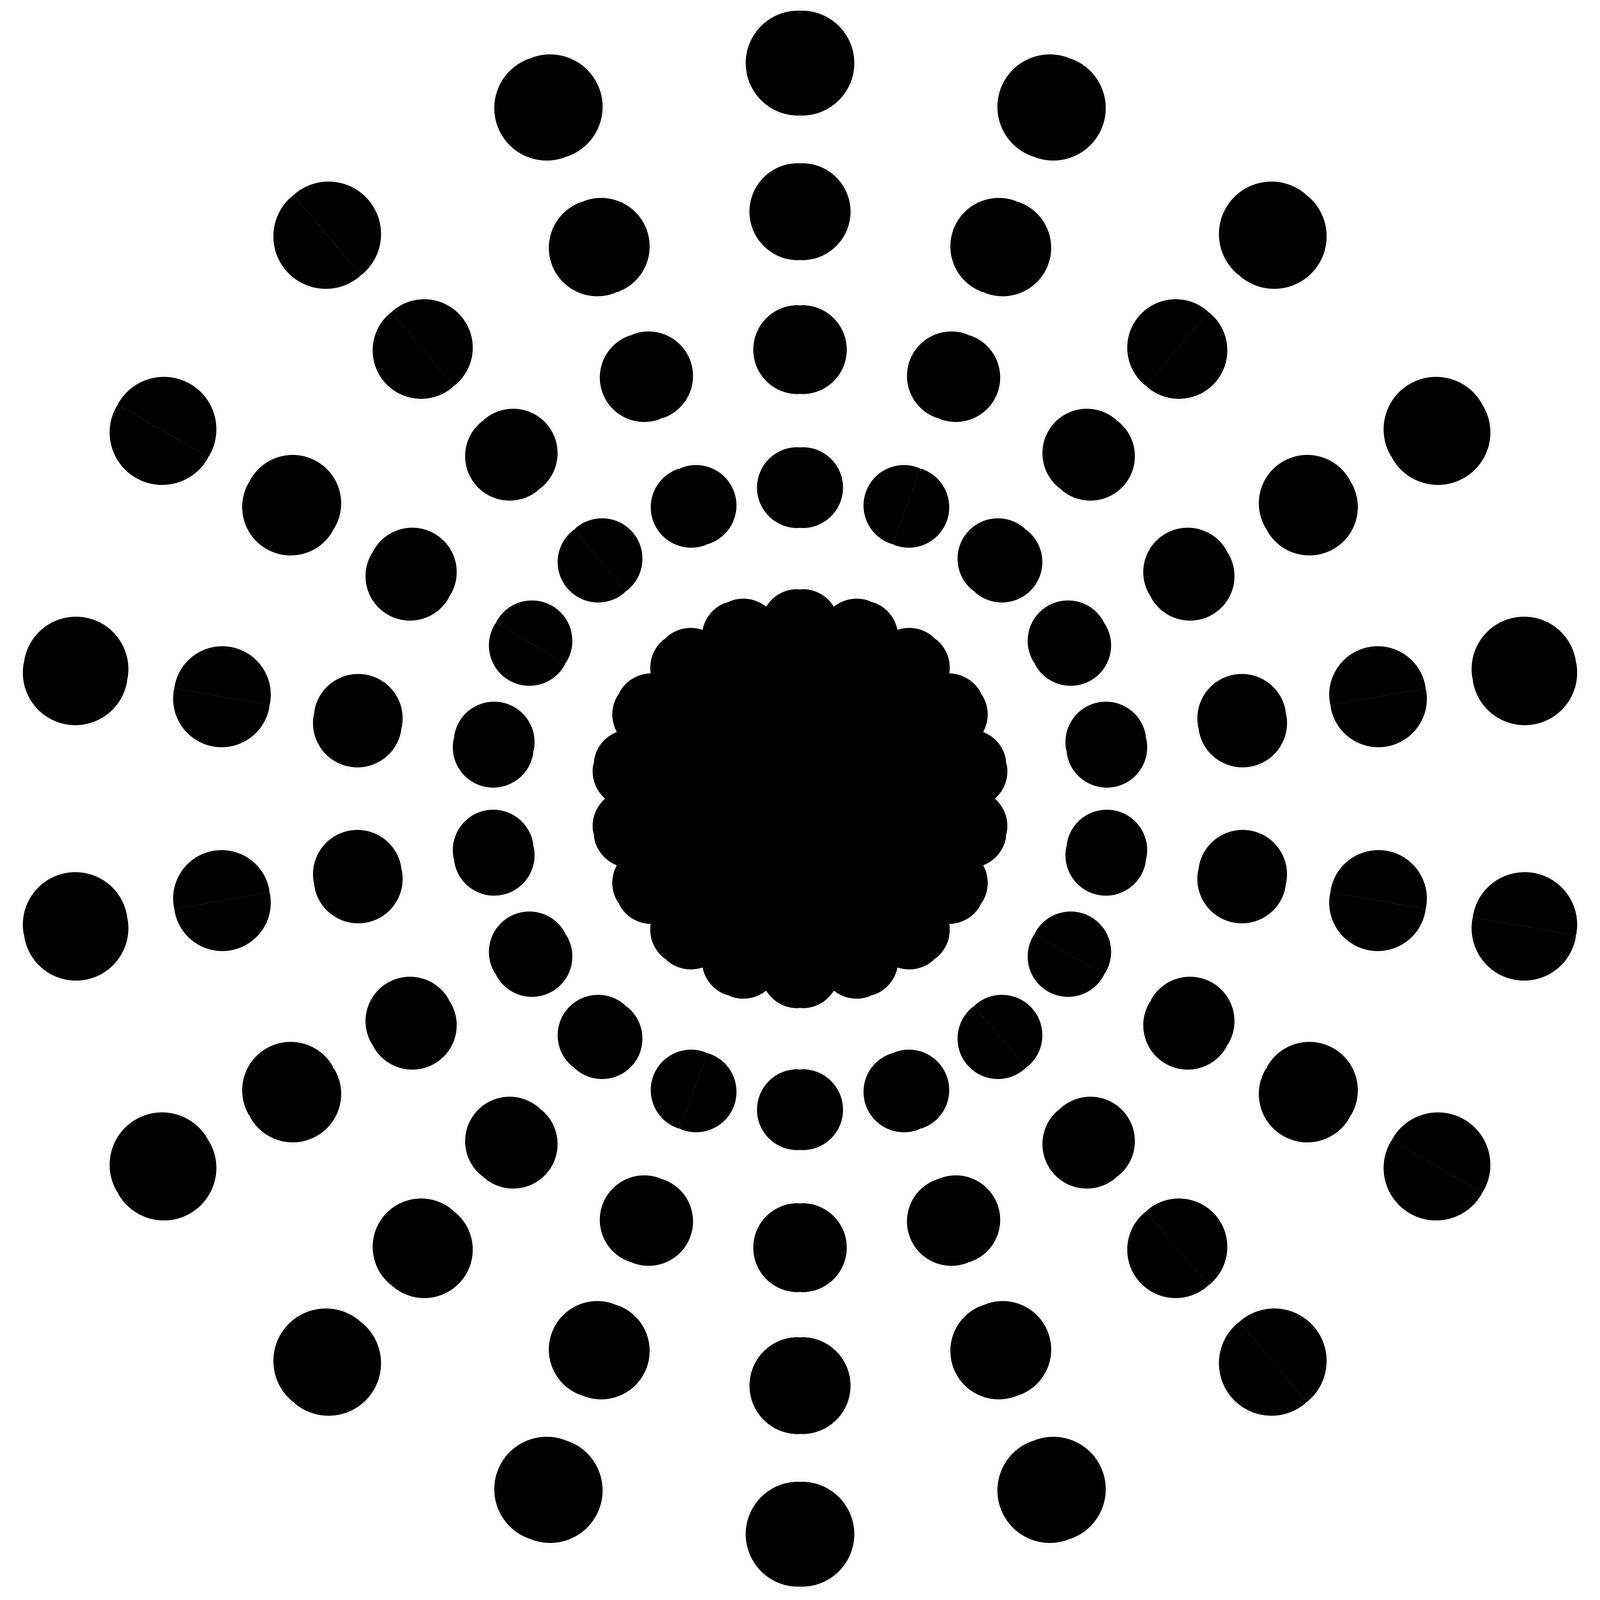 Dark Dots Clipart 20 Free Cliparts